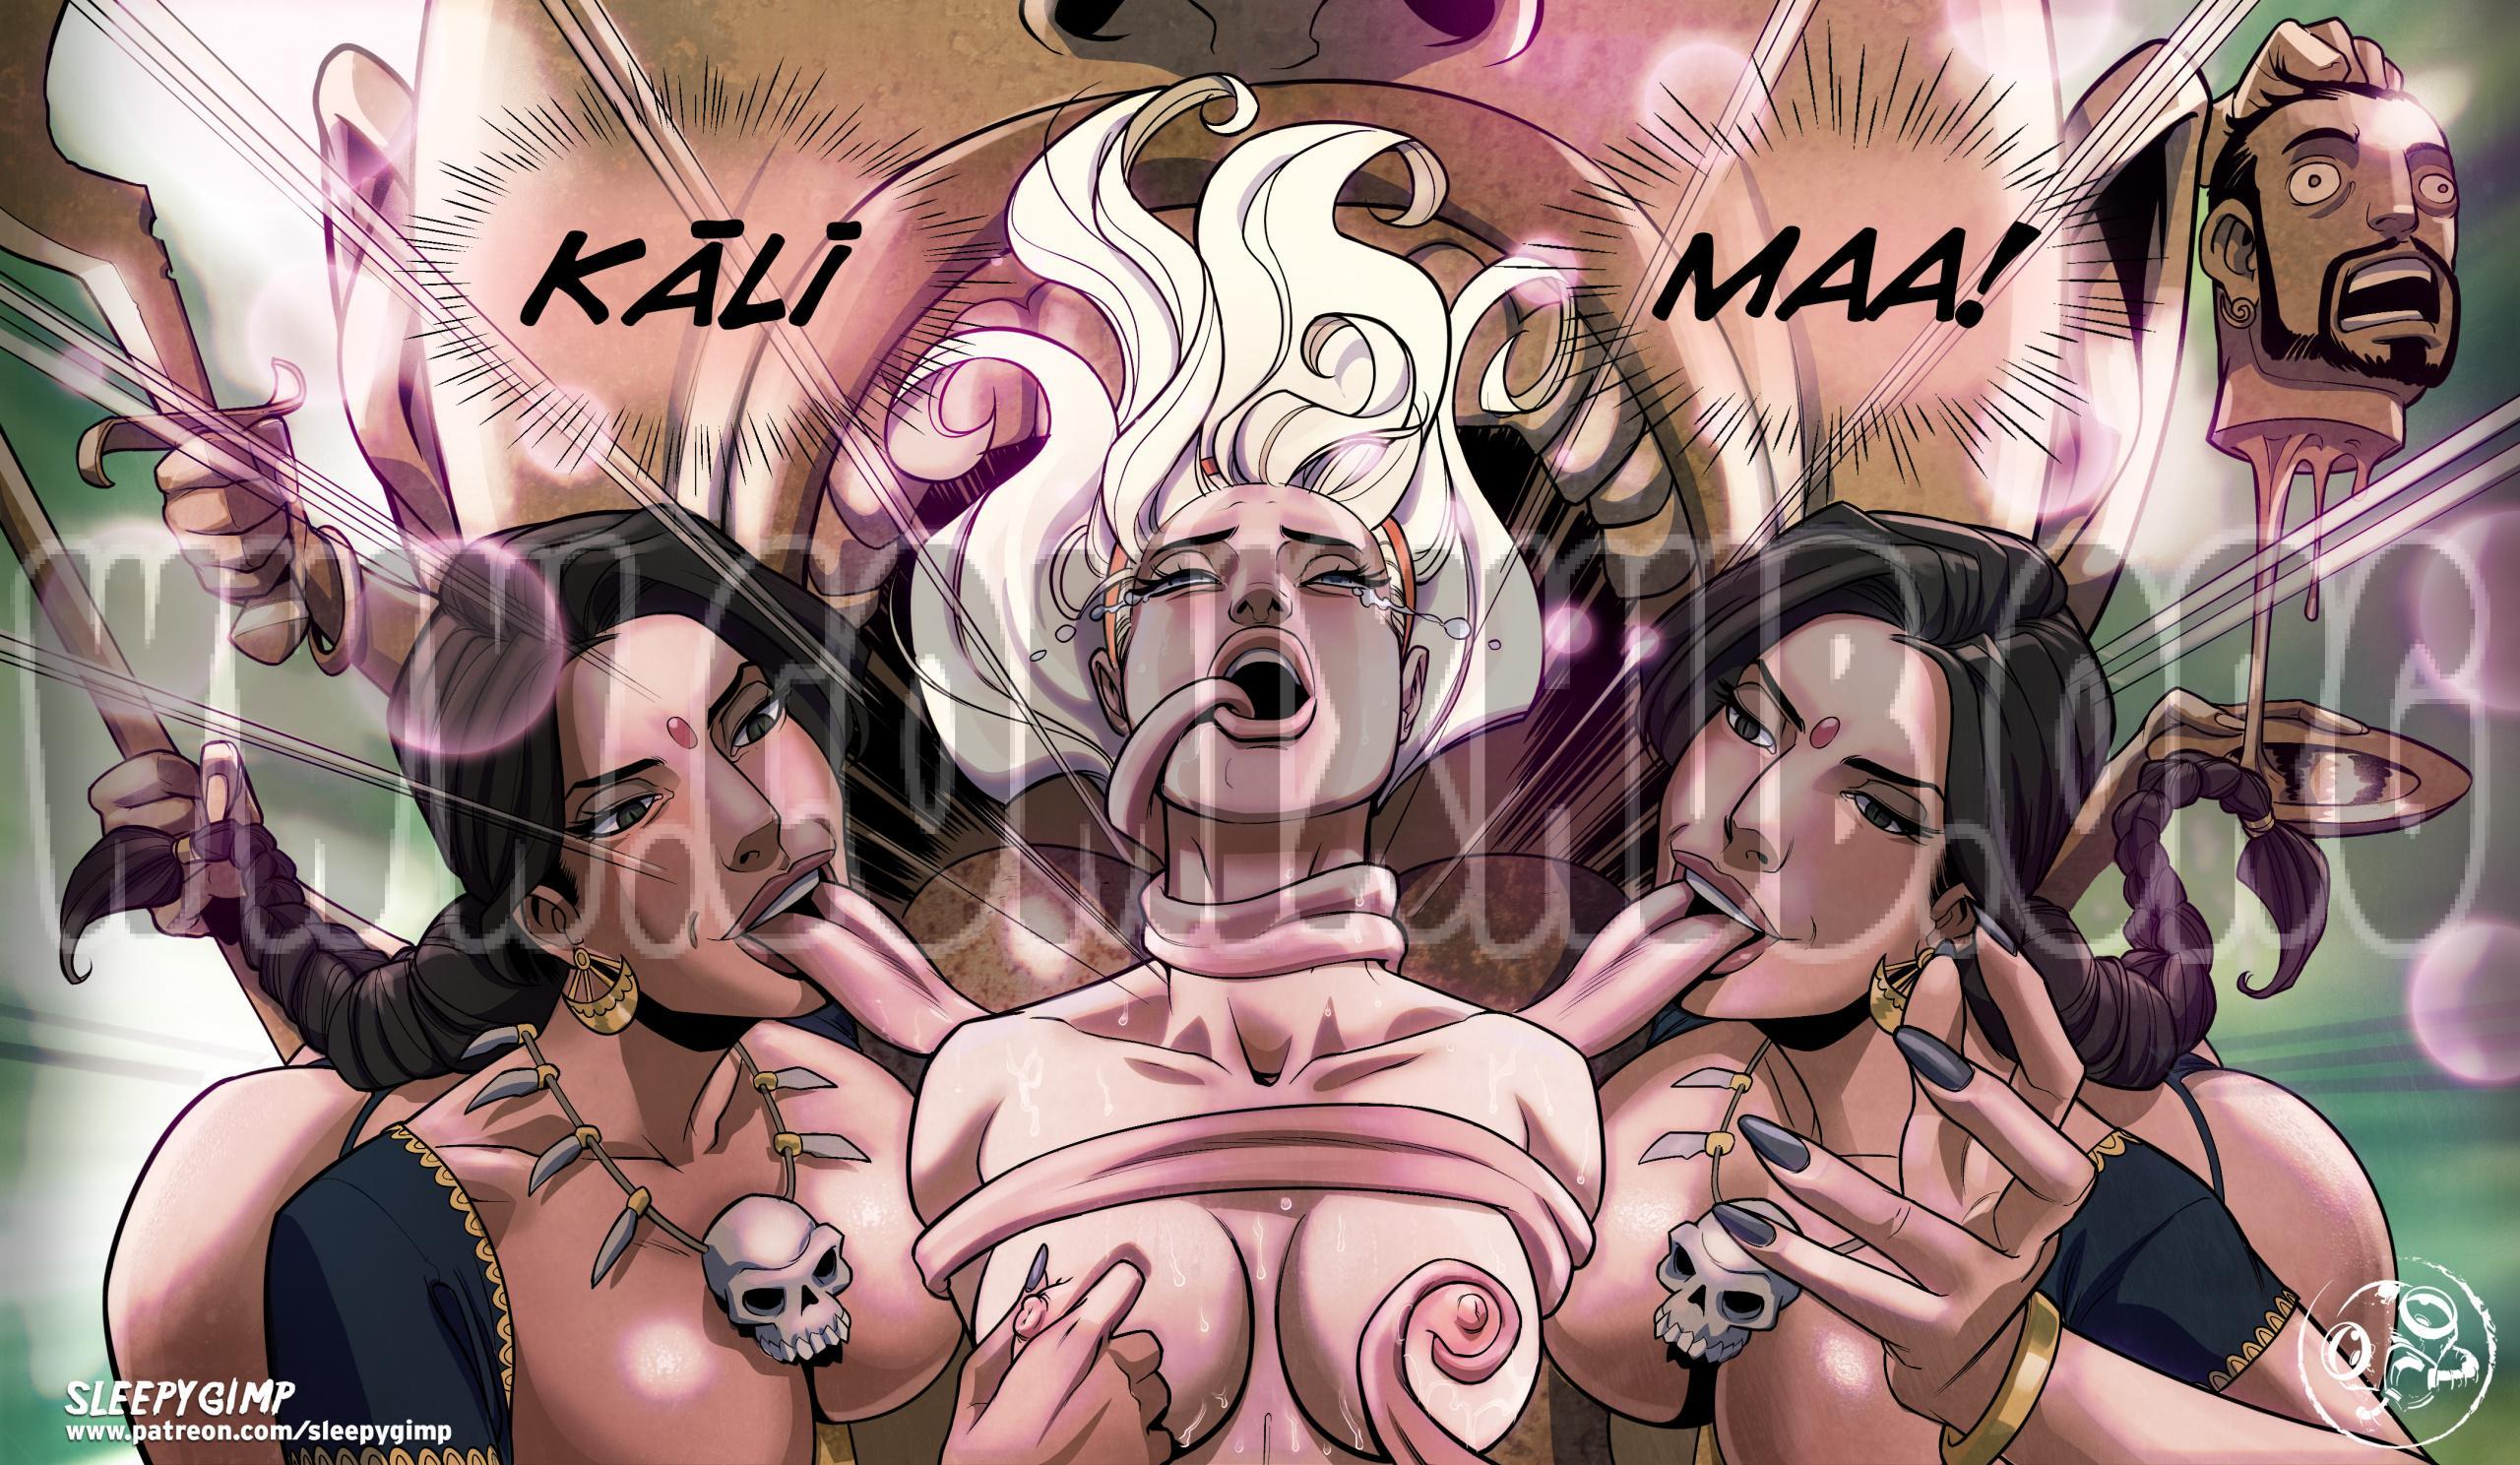 Yoga Hypnosis porn comics Oral sex, Big Tits, cunnilingus, Femdom, fingering, Footjob, Group Sex, Lesbians, Rape, Sex Toys, X-Ray